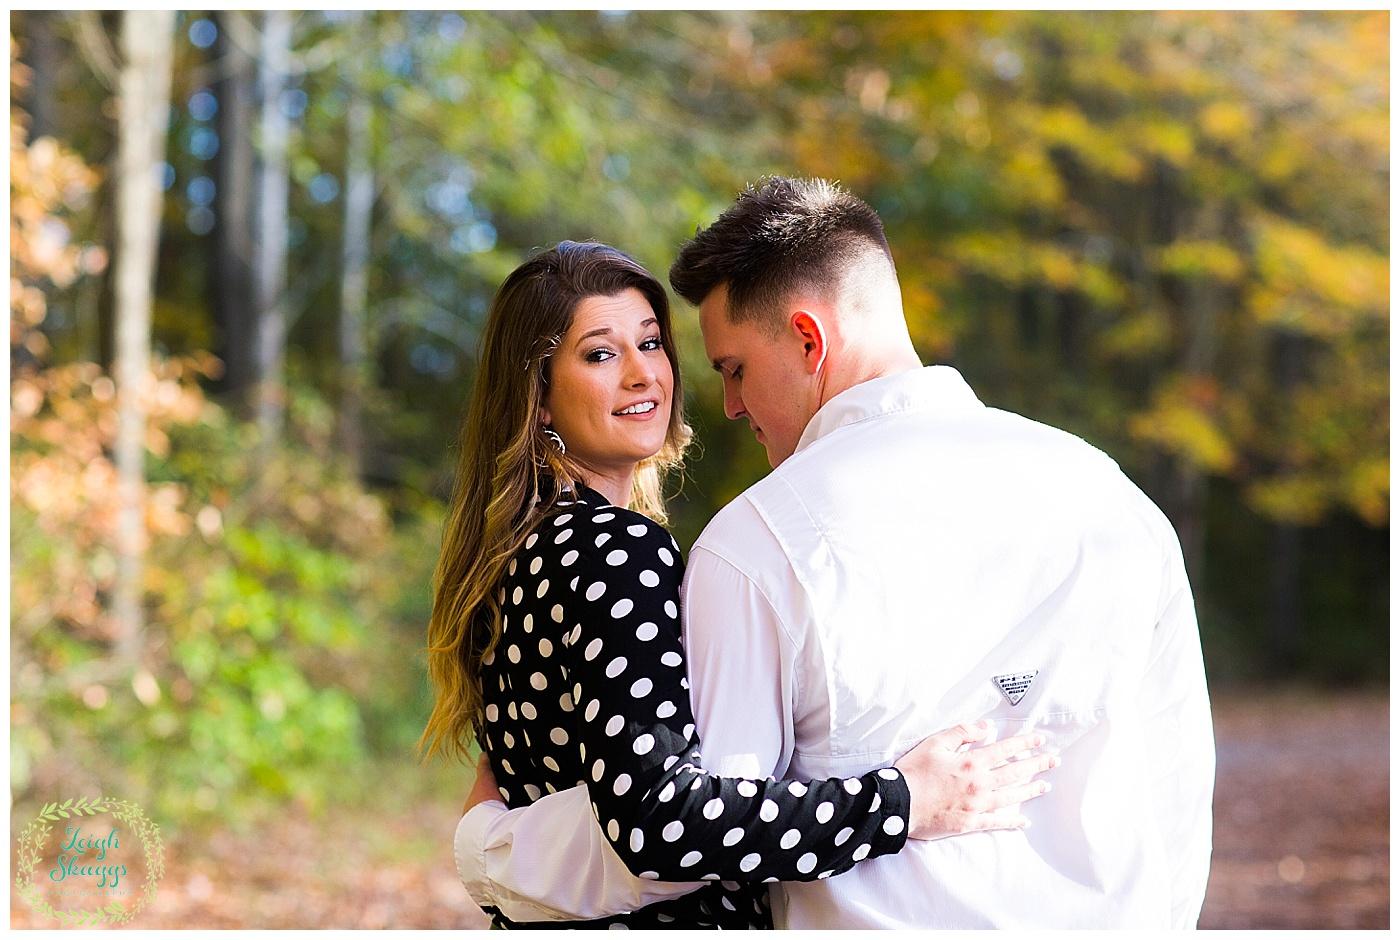 Lyndsi & Brandon | Oak Grove Lake Park Couples Session